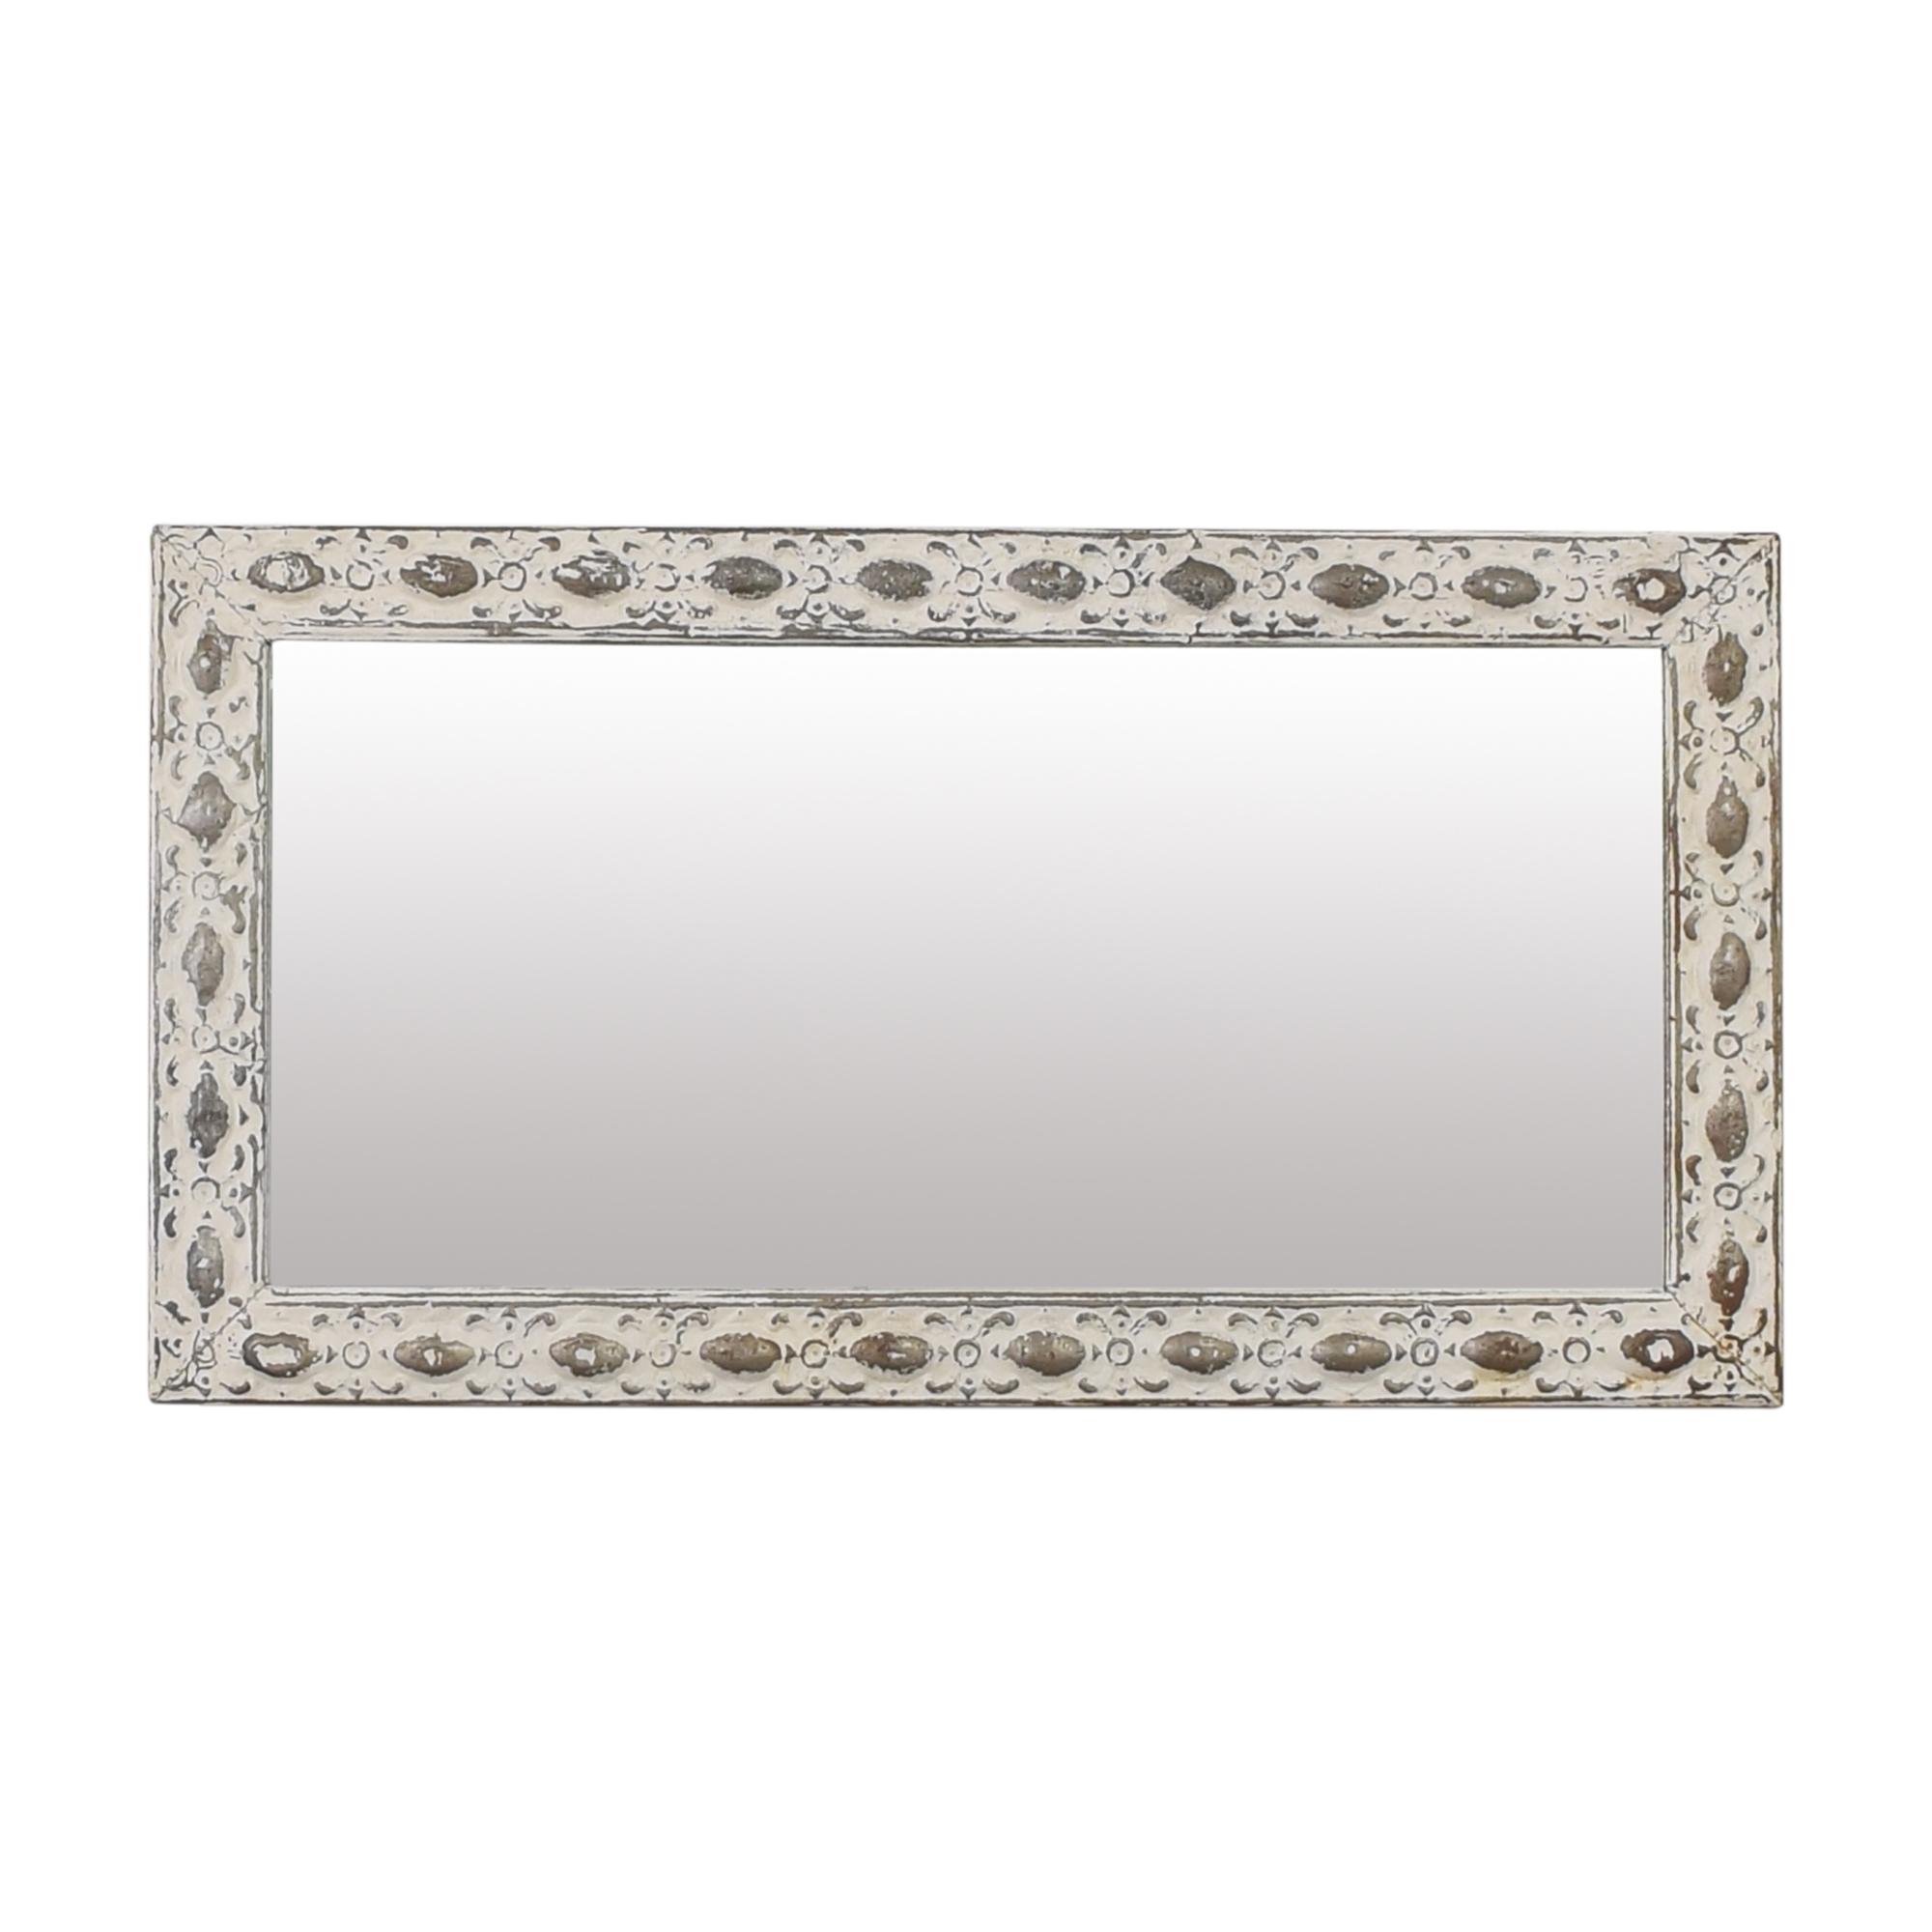 shop Olde Good Things Vintage Style Framed Mirror Olde Good Things Mirrors